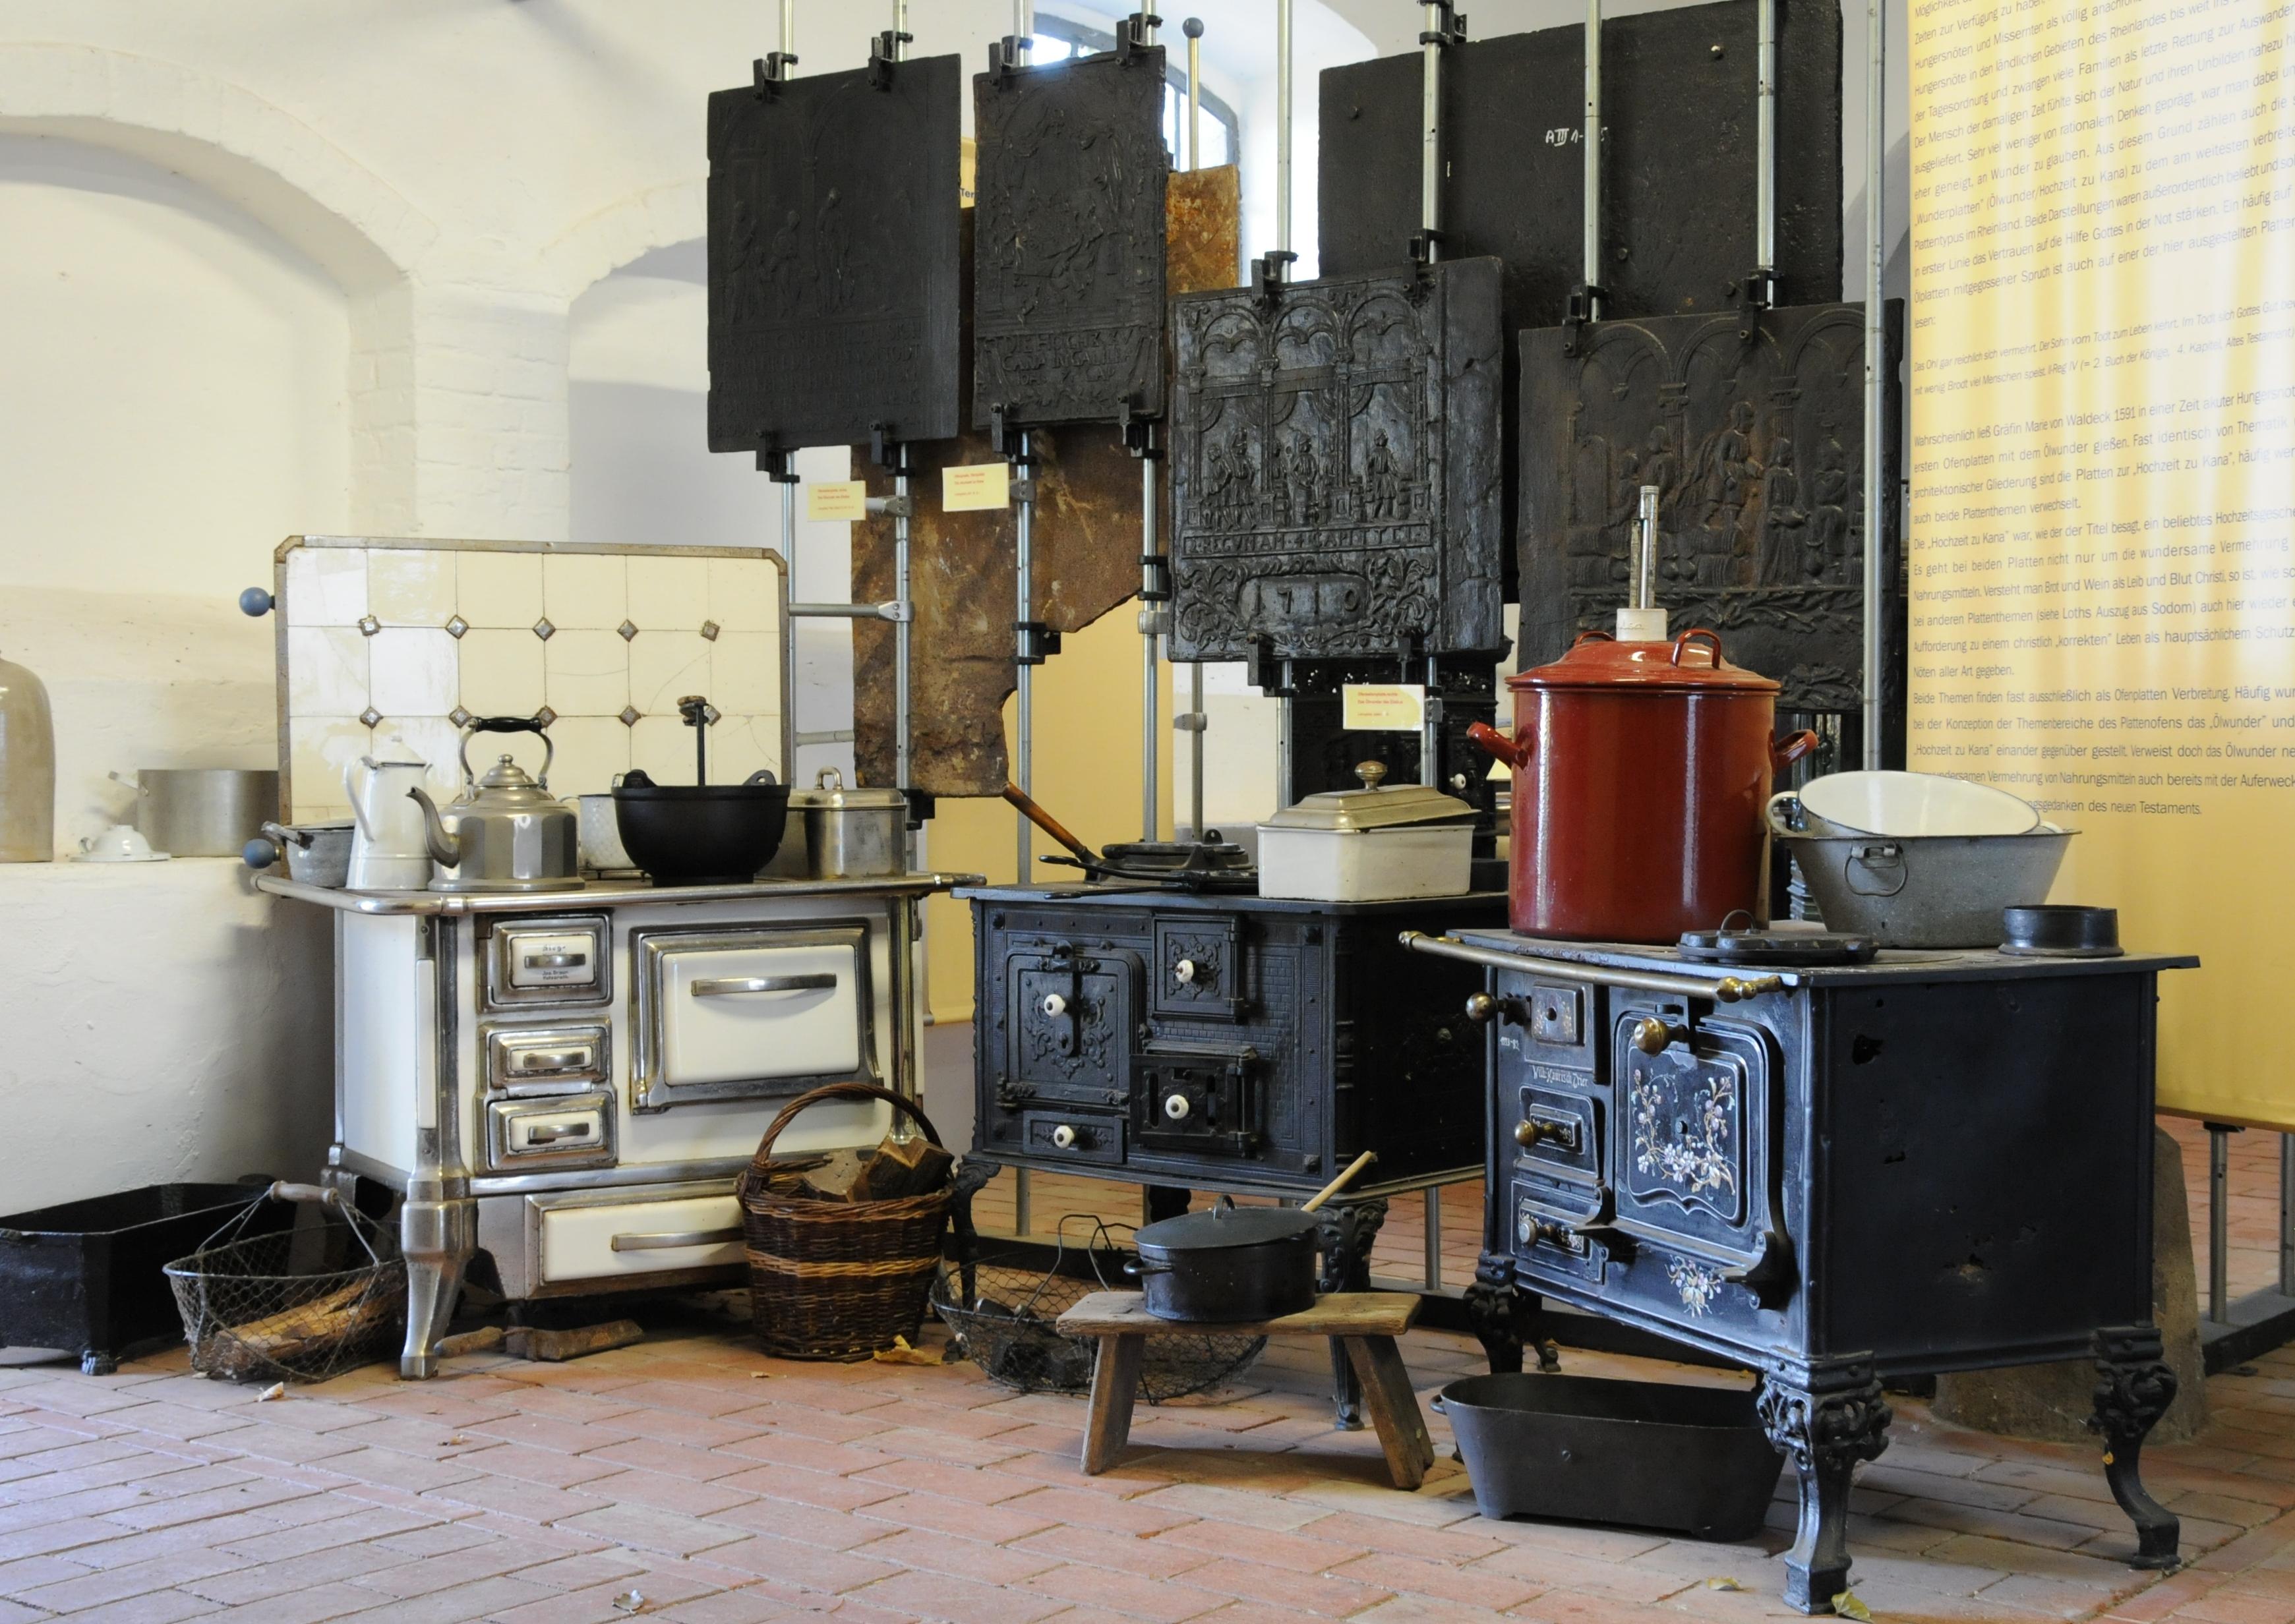 Piano De Cuisson Avec Four Gaz fourneau (cuisine) — wikipédia